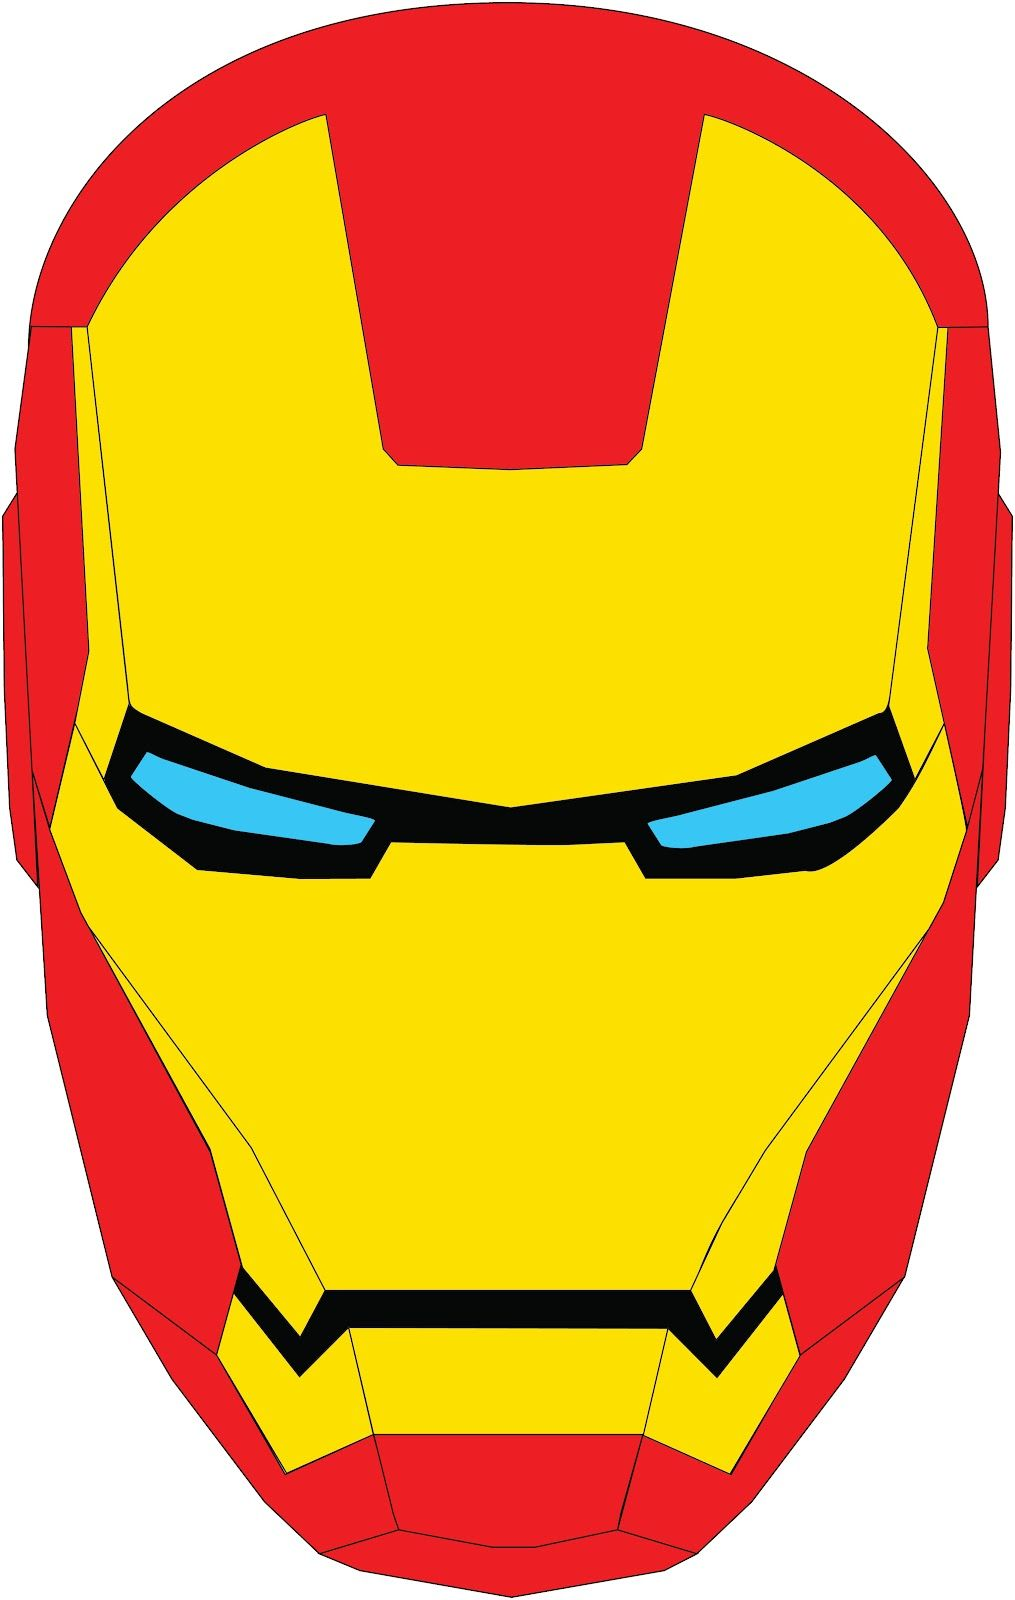 iron man mascara vector - Buscar con Google | tortaaasssss ...